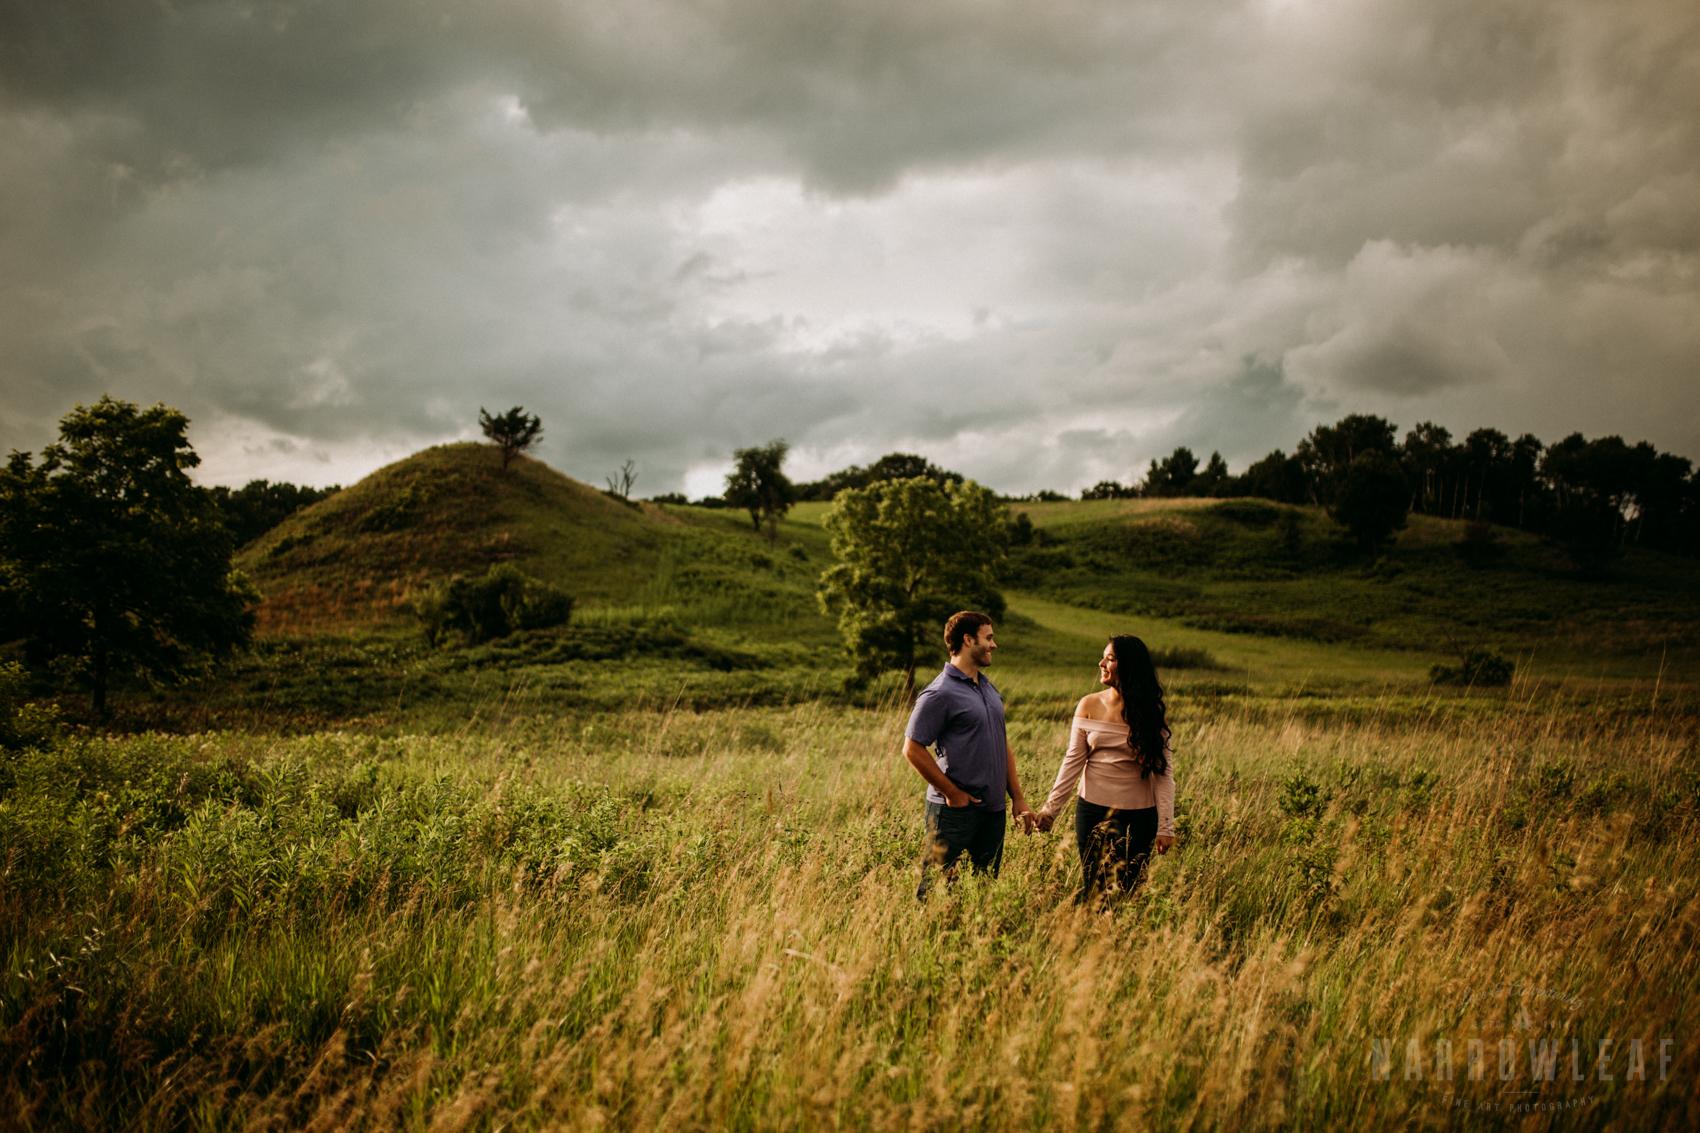 summer-engagement-photos-frontenac-mn-NarrowLeaf_Love_&_Adventure_Photography-7.jpg